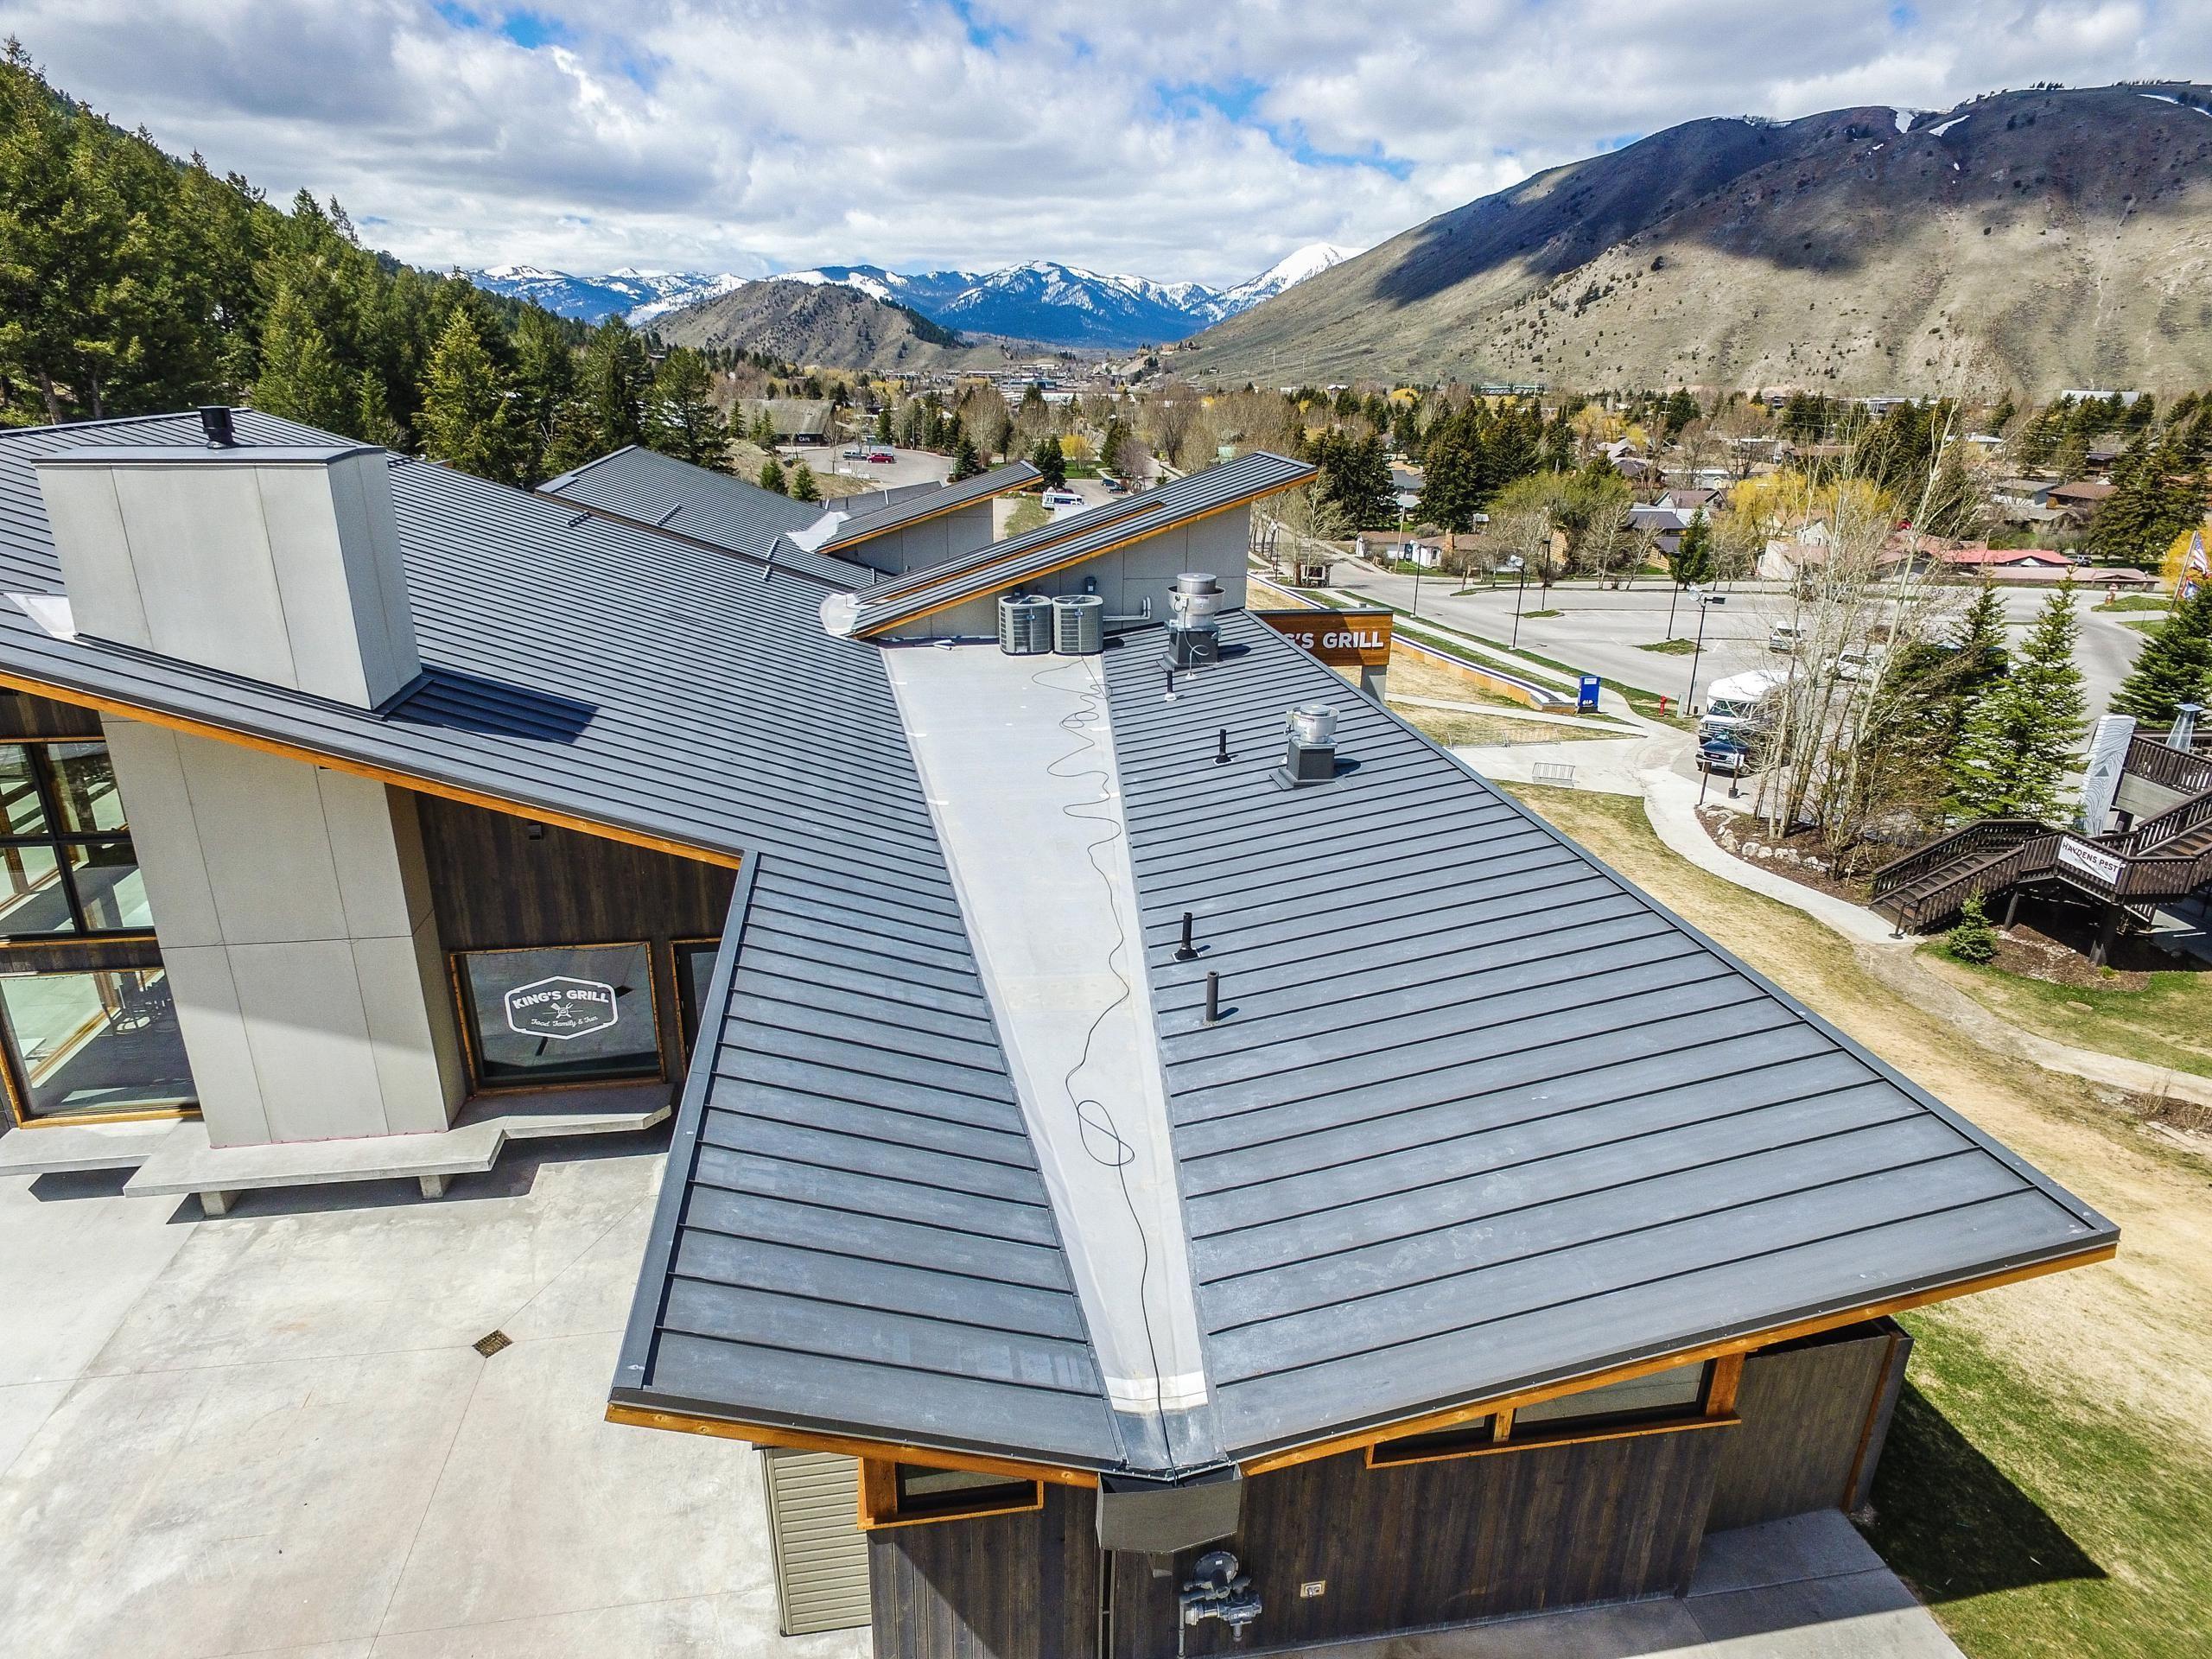 Standing Seam Metal Roofing Bonderized Commercial Metal Roofing Roofing Metal Roof